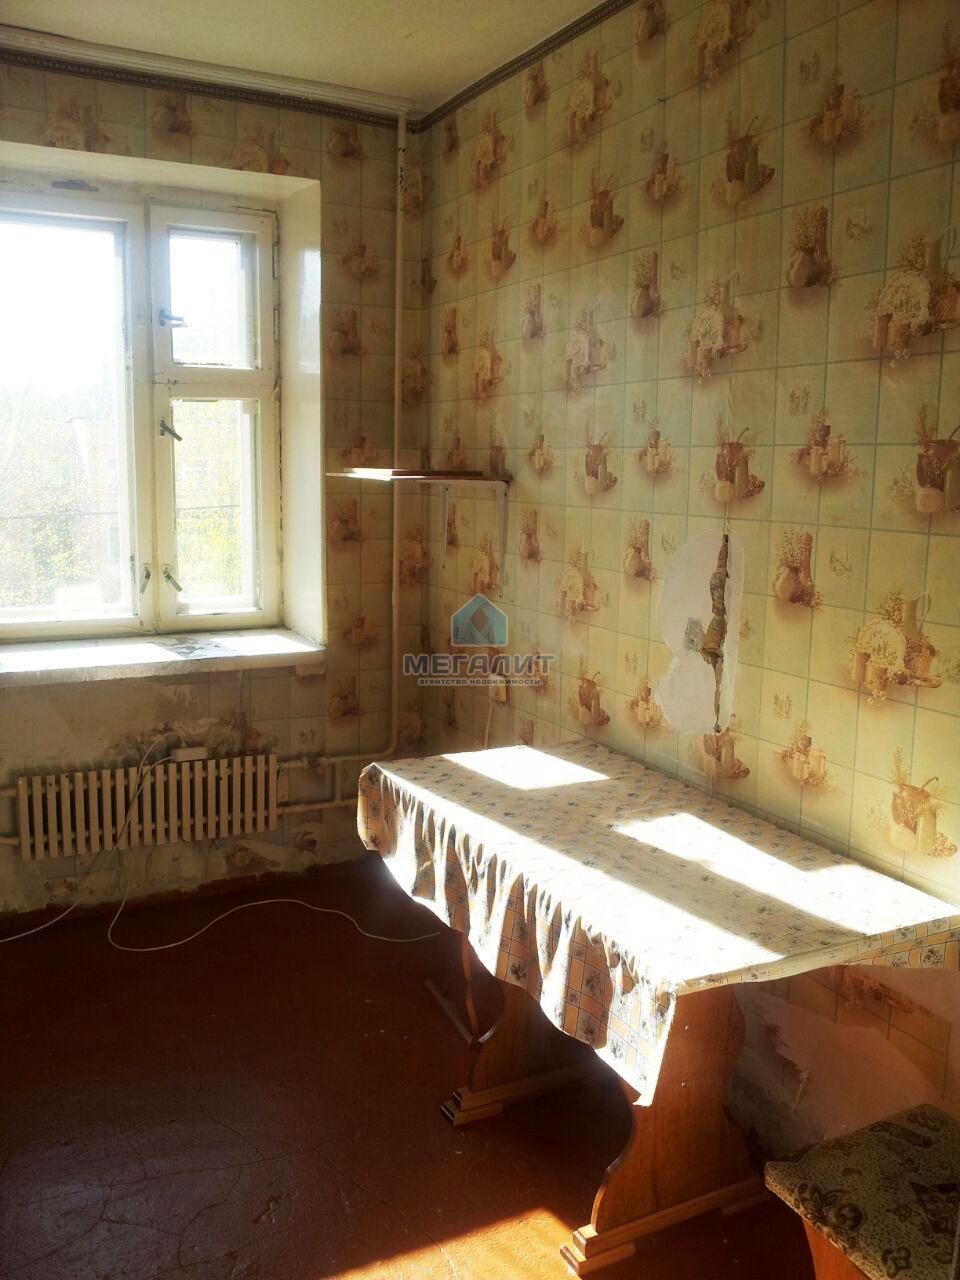 Двухкомнатная квартира в Ново-Савиновском районе! (миниатюра №9)